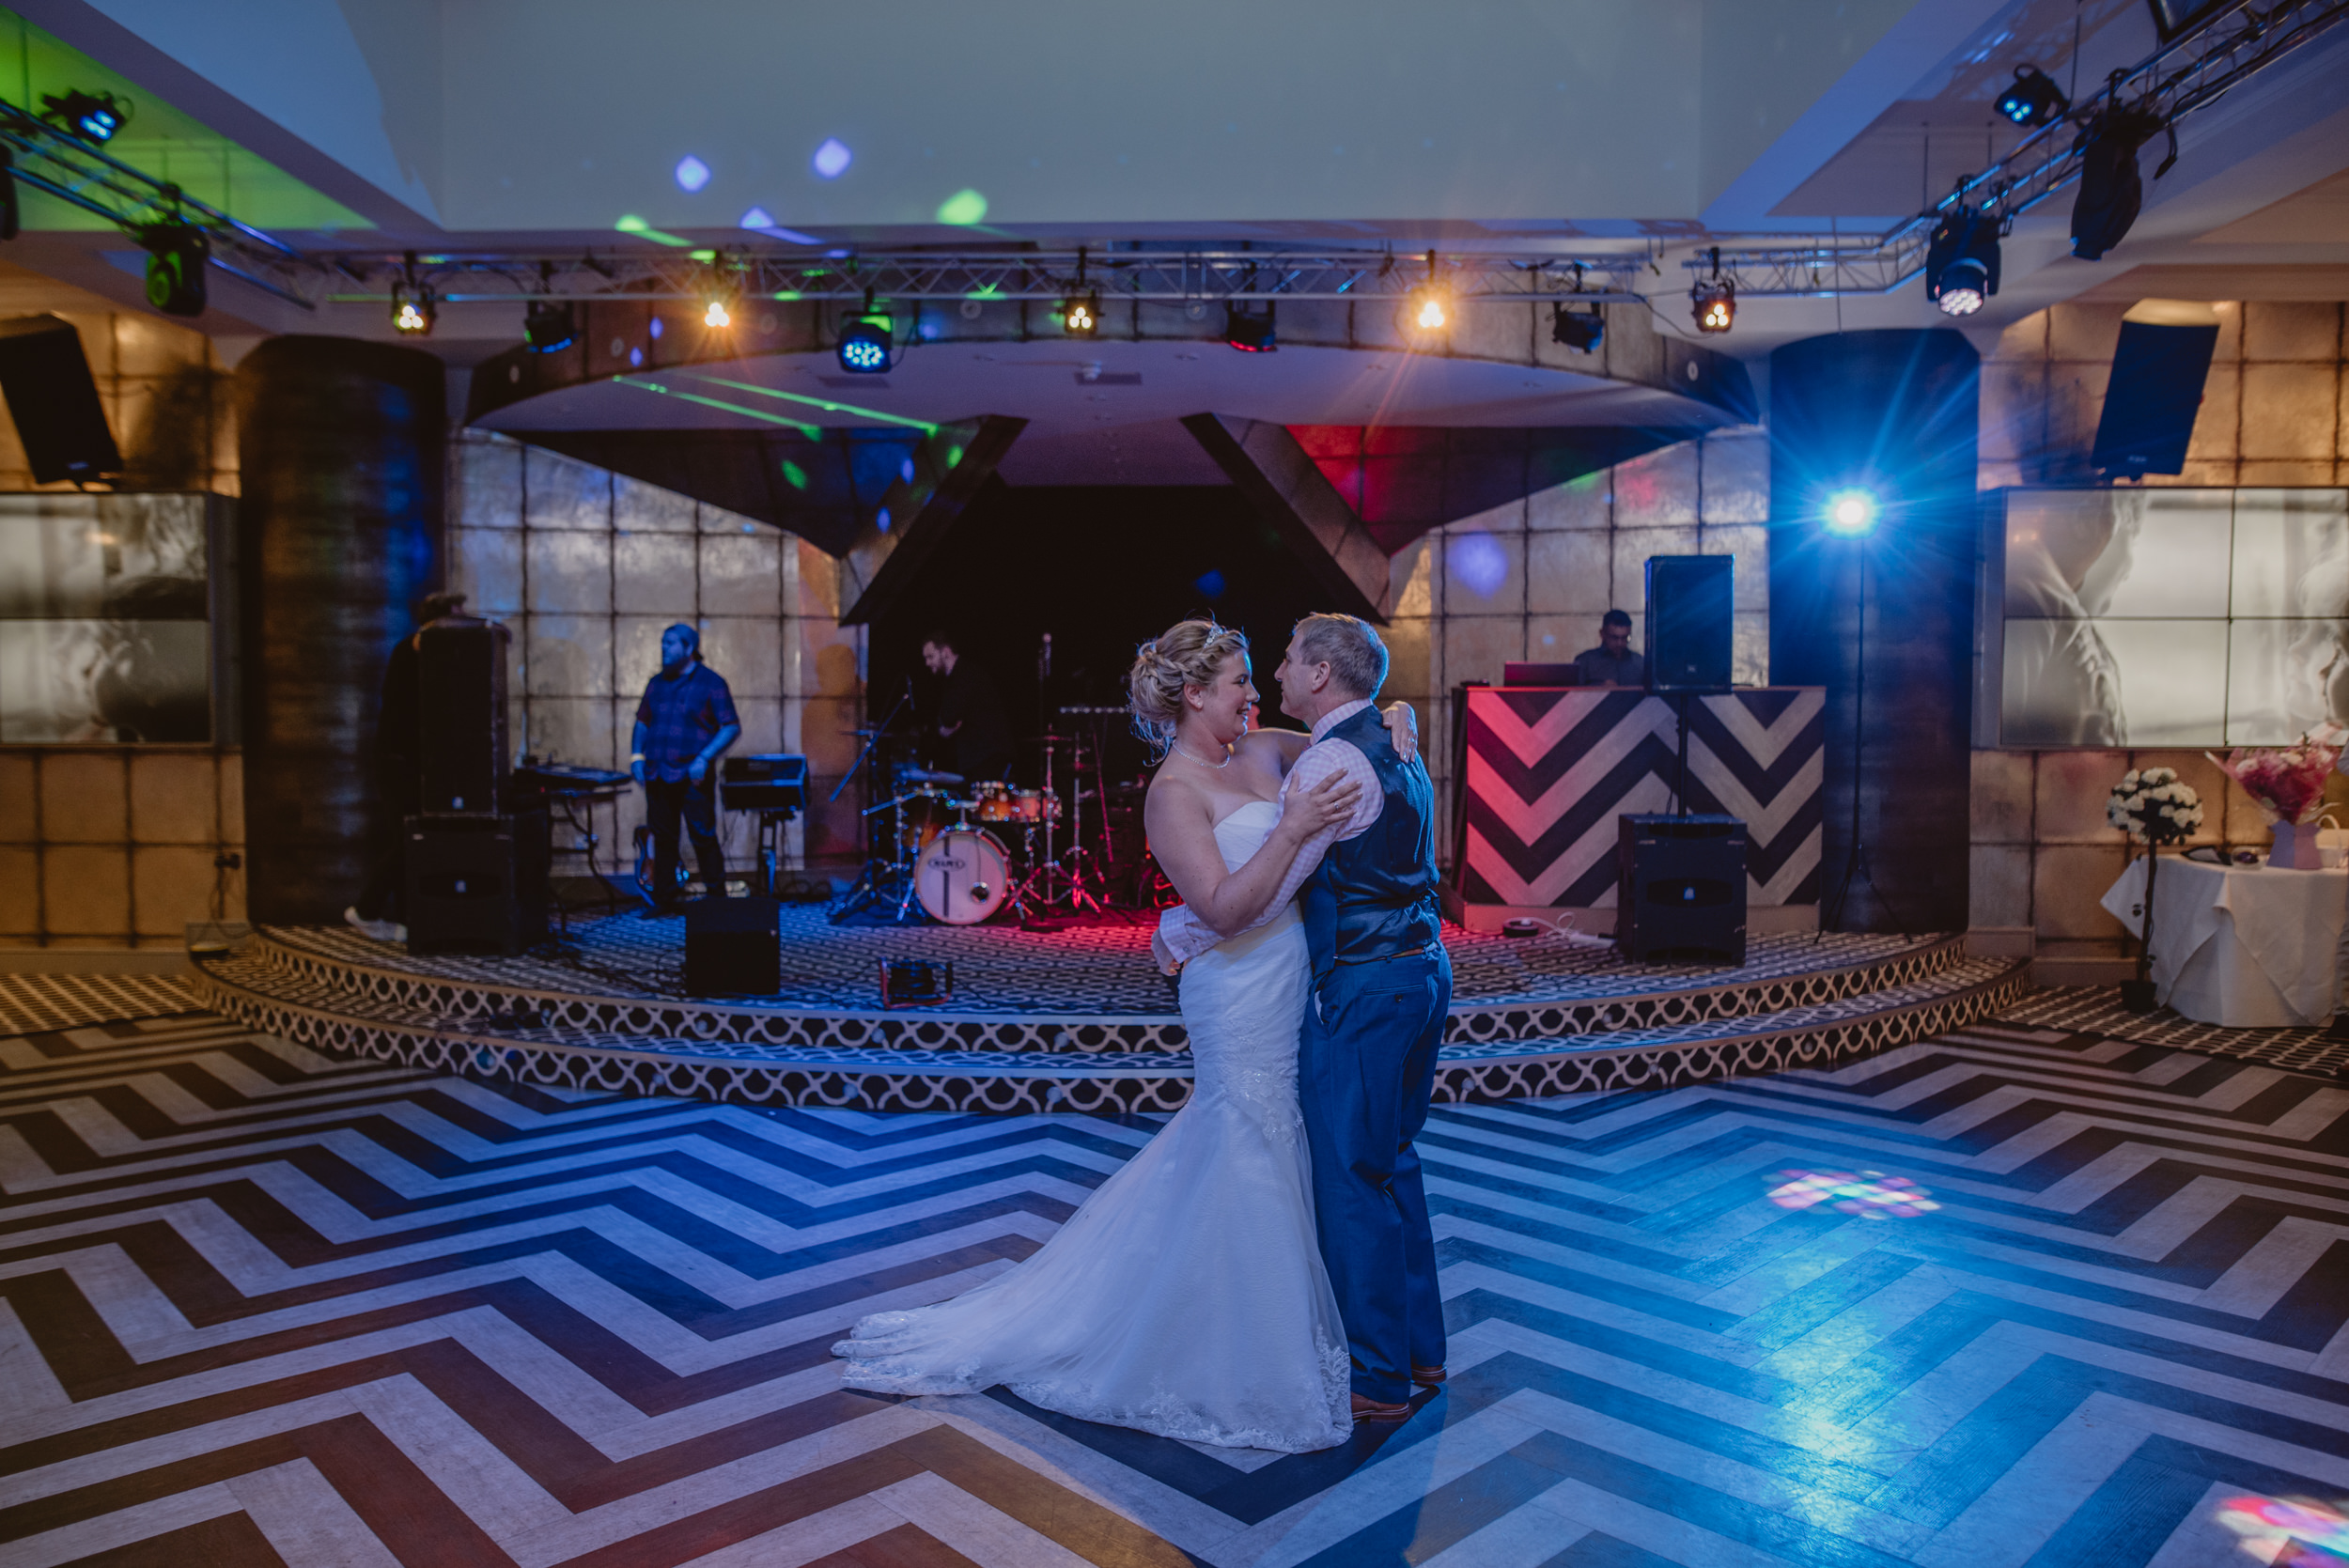 Chantelle-and-Stephen-Old-Thorns-Hotel-Wedding-Liphook-Manu-Mendoza-Wedding-Photography-531.jpg